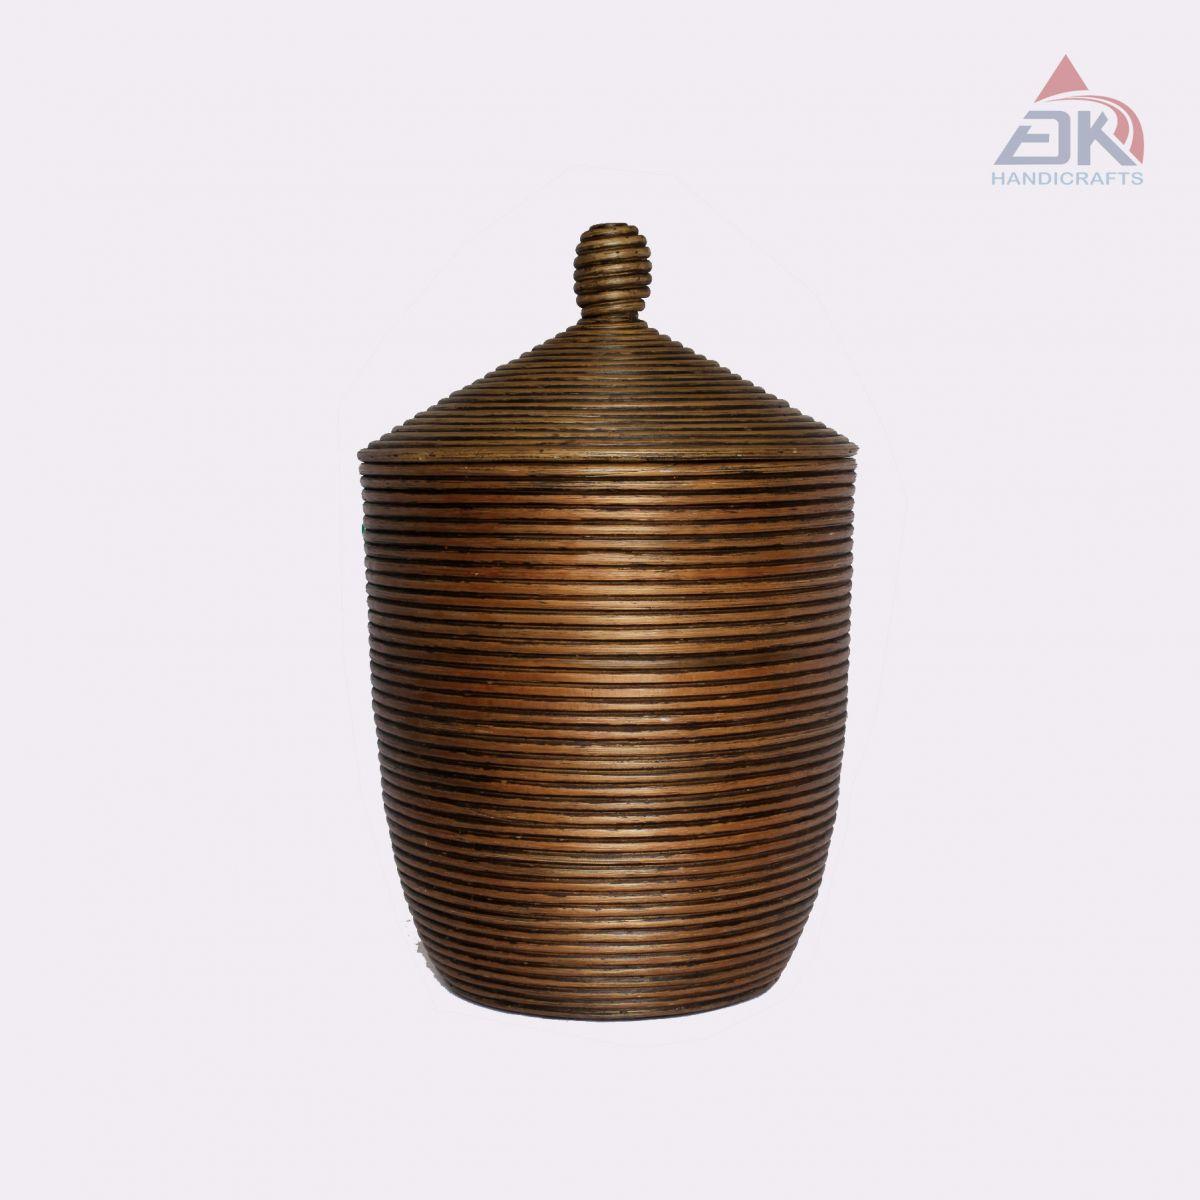 Rattan Coiled Basket # DK50